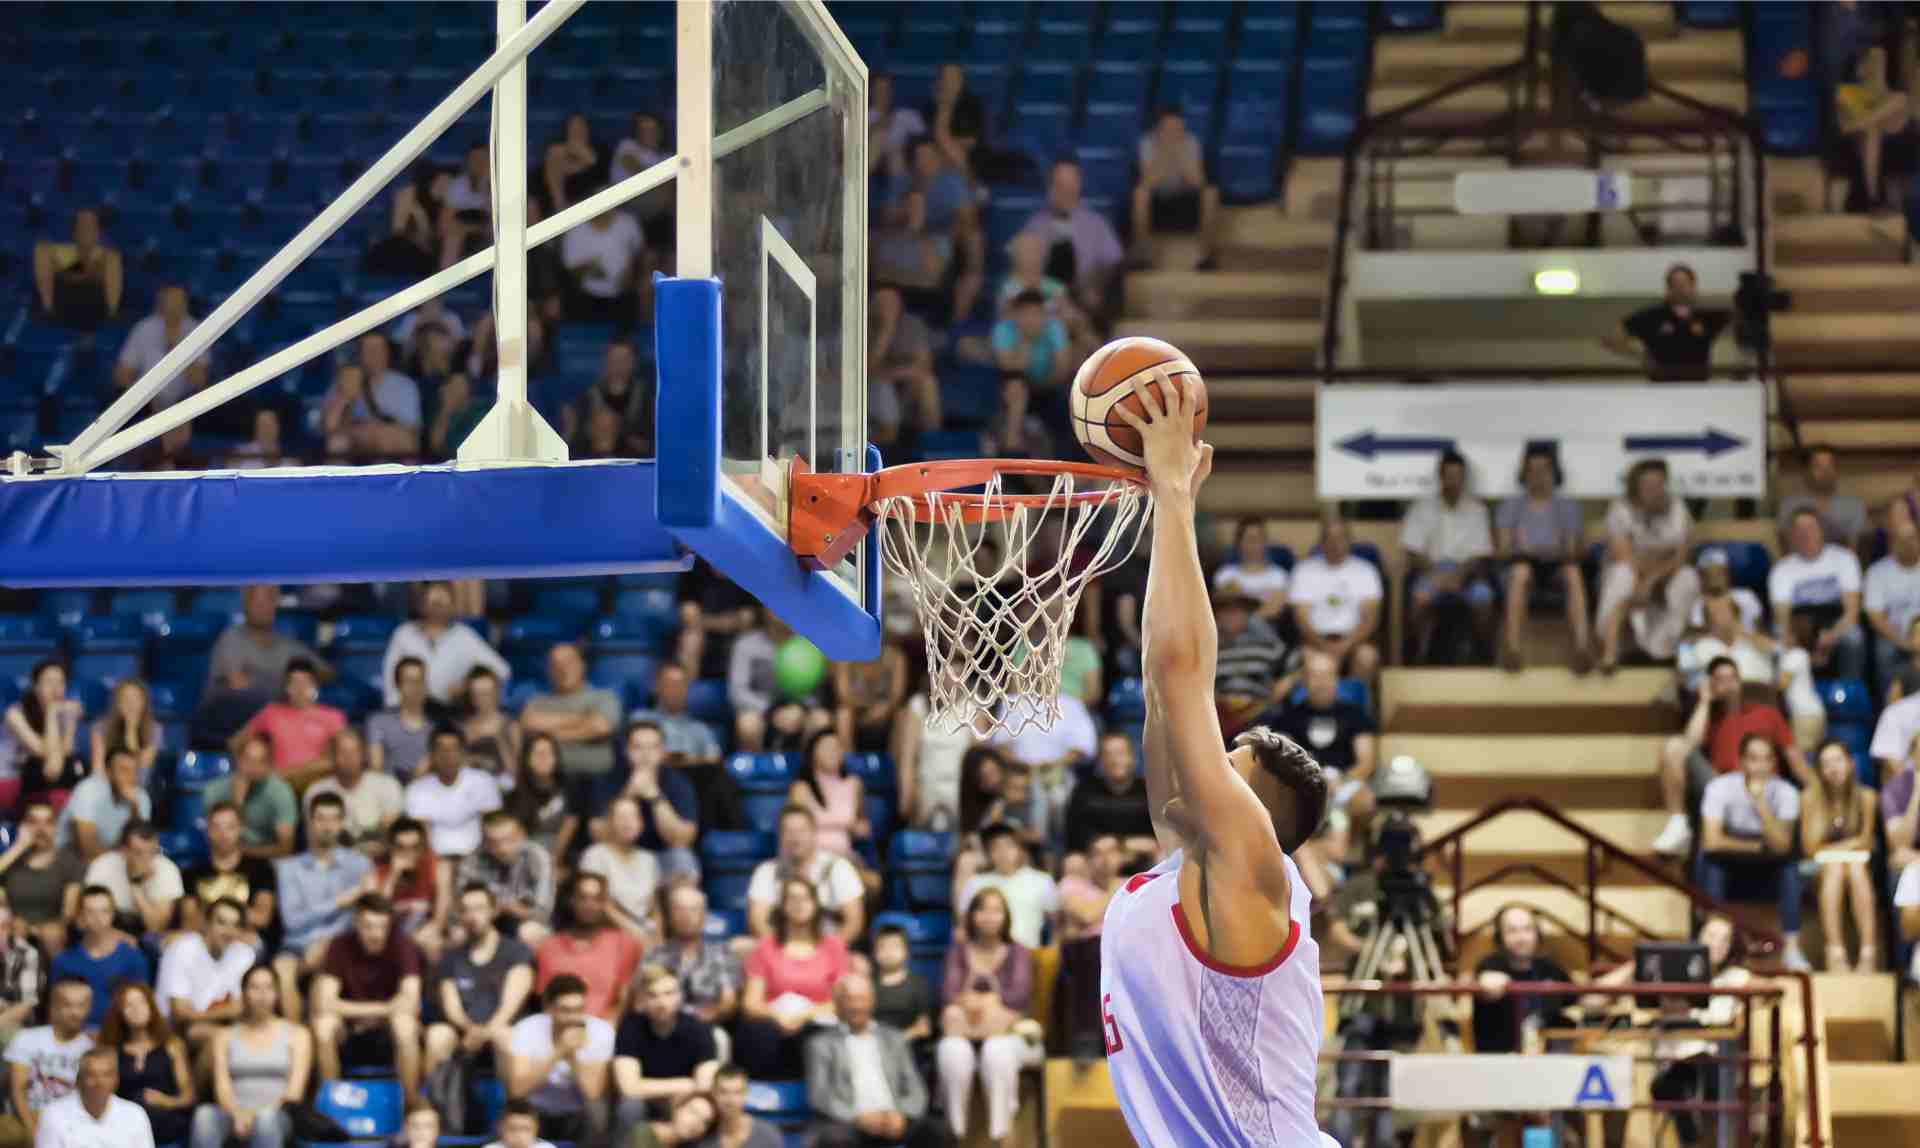 Player throws basketball into the basket